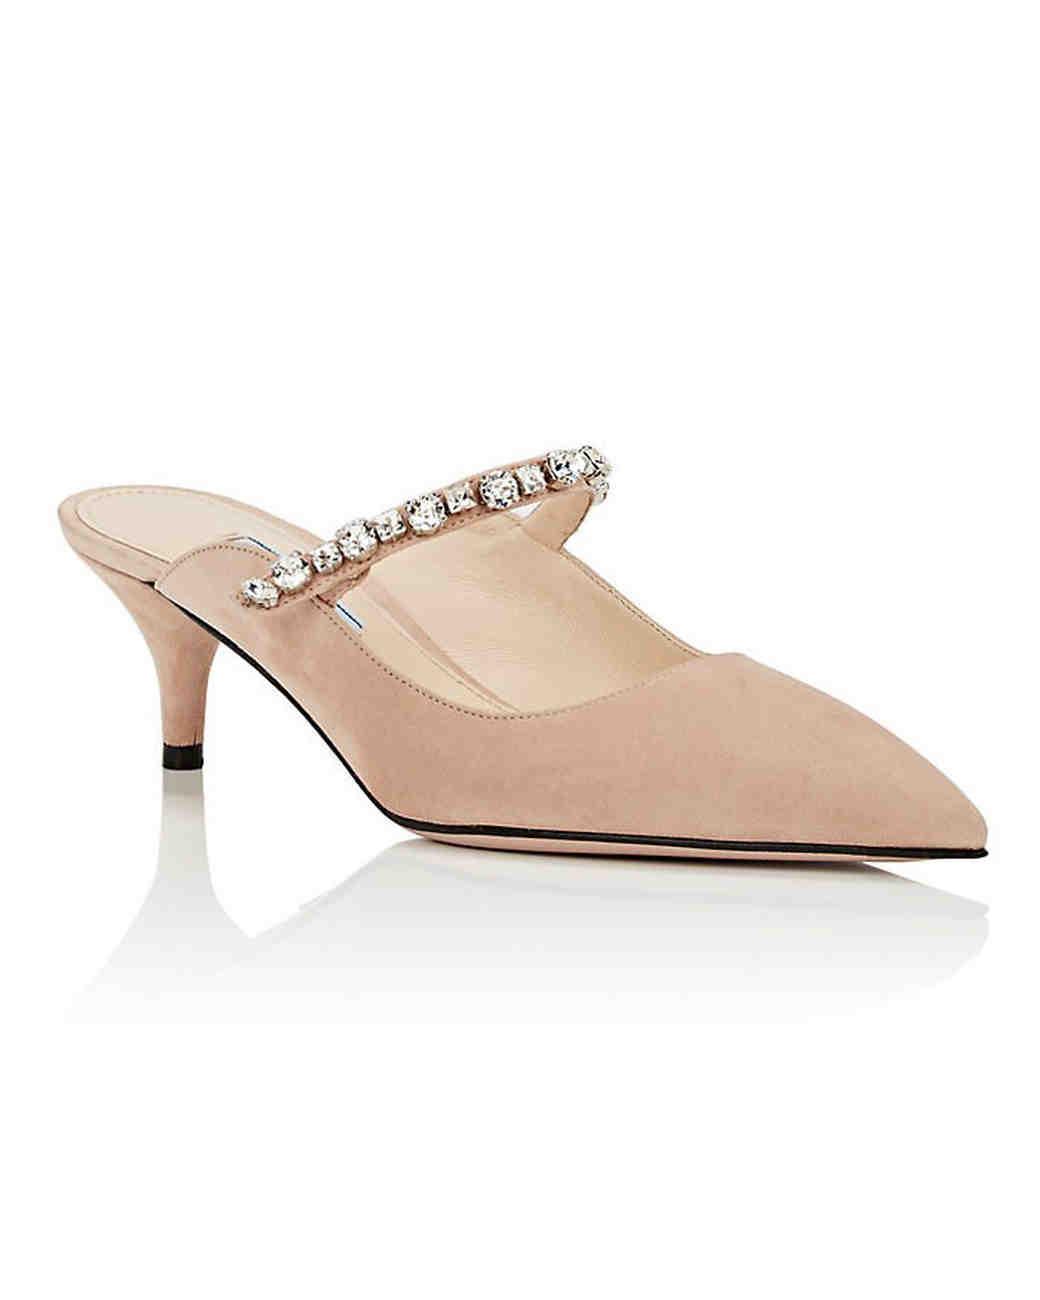 nude shoe crystal embellished suede mules prada